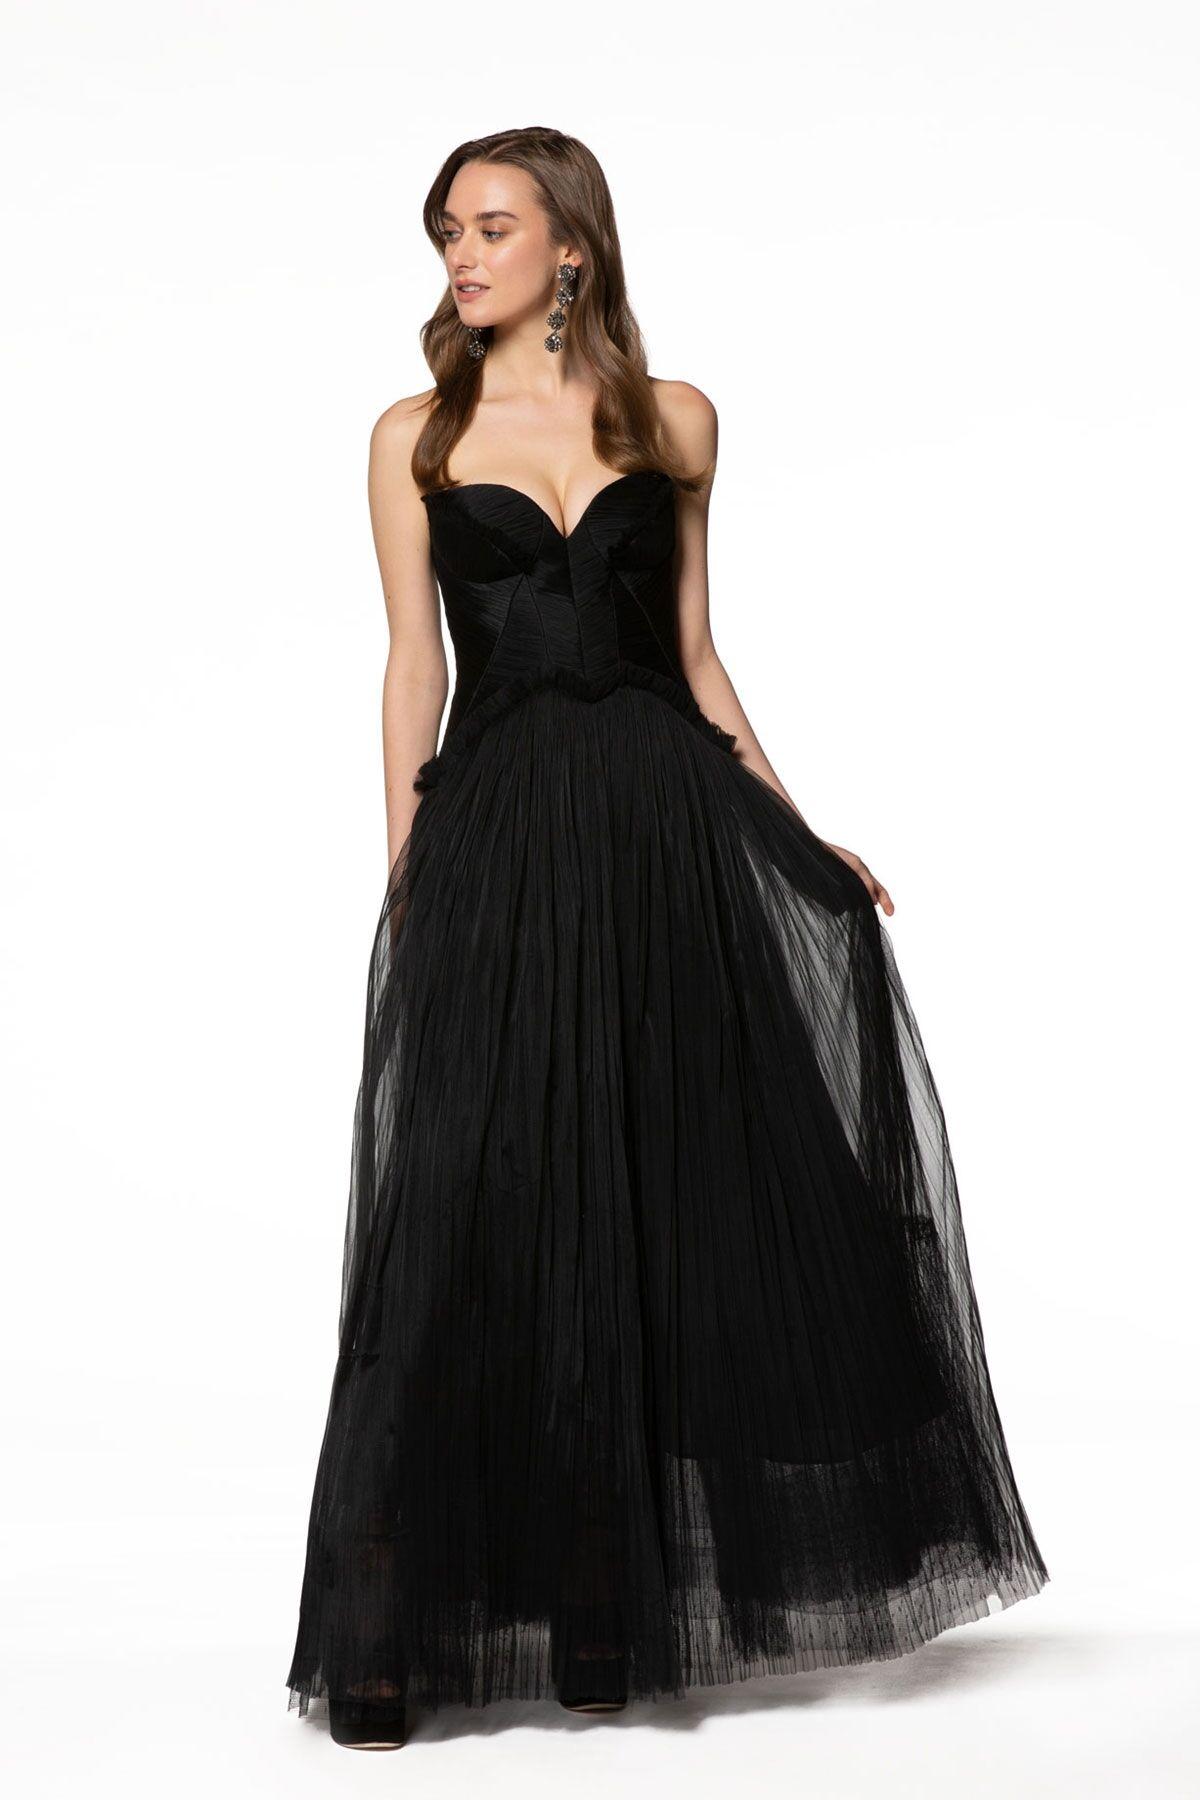 Tül Etek, Kalp Yaka Siyah Elbise